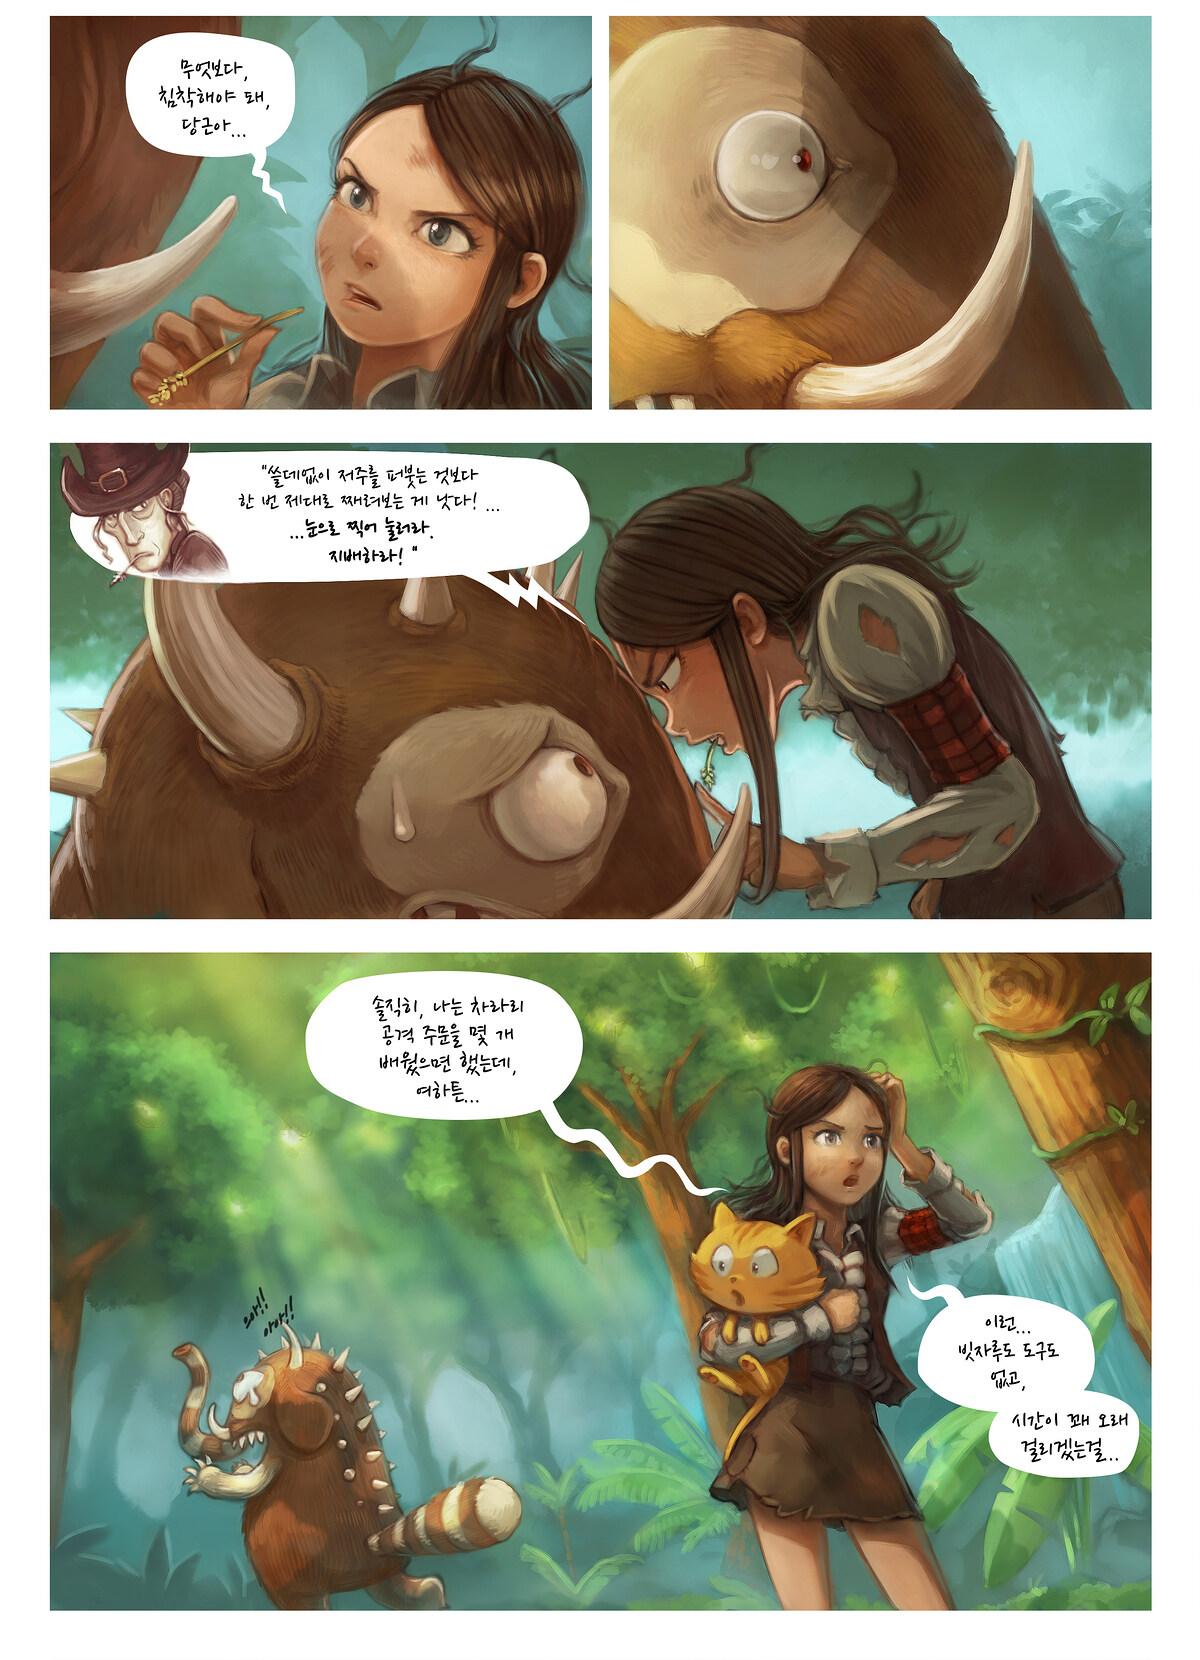 A webcomic page of Pepper&Carrot, 에피소드 17 [kr], 페이지 4